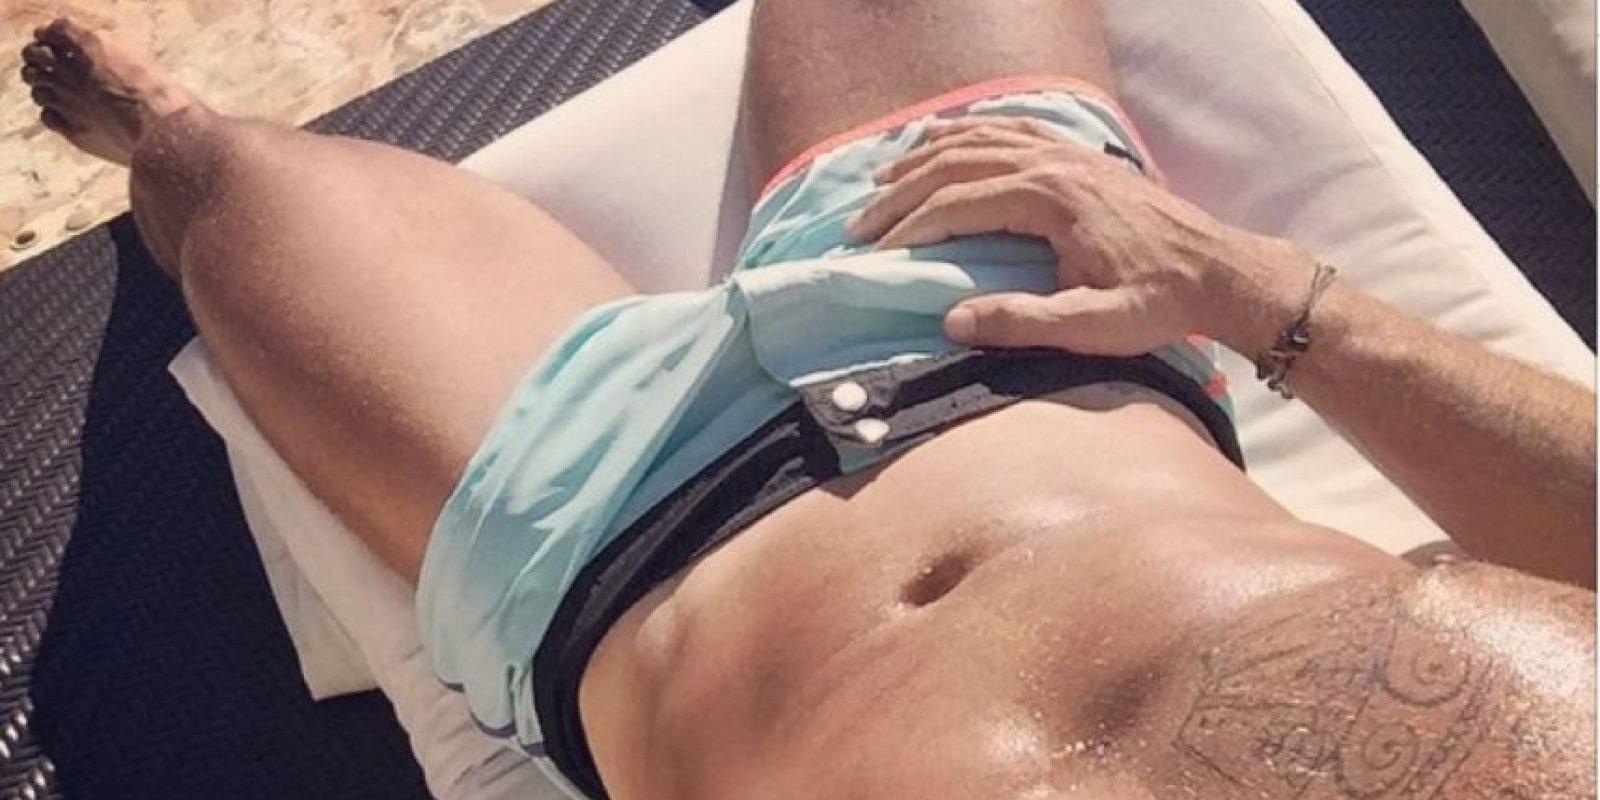 Ricky Martin siempre sorprende agradablemente a sus fans en redes sociales Foto:Instagram/Ricky Martin